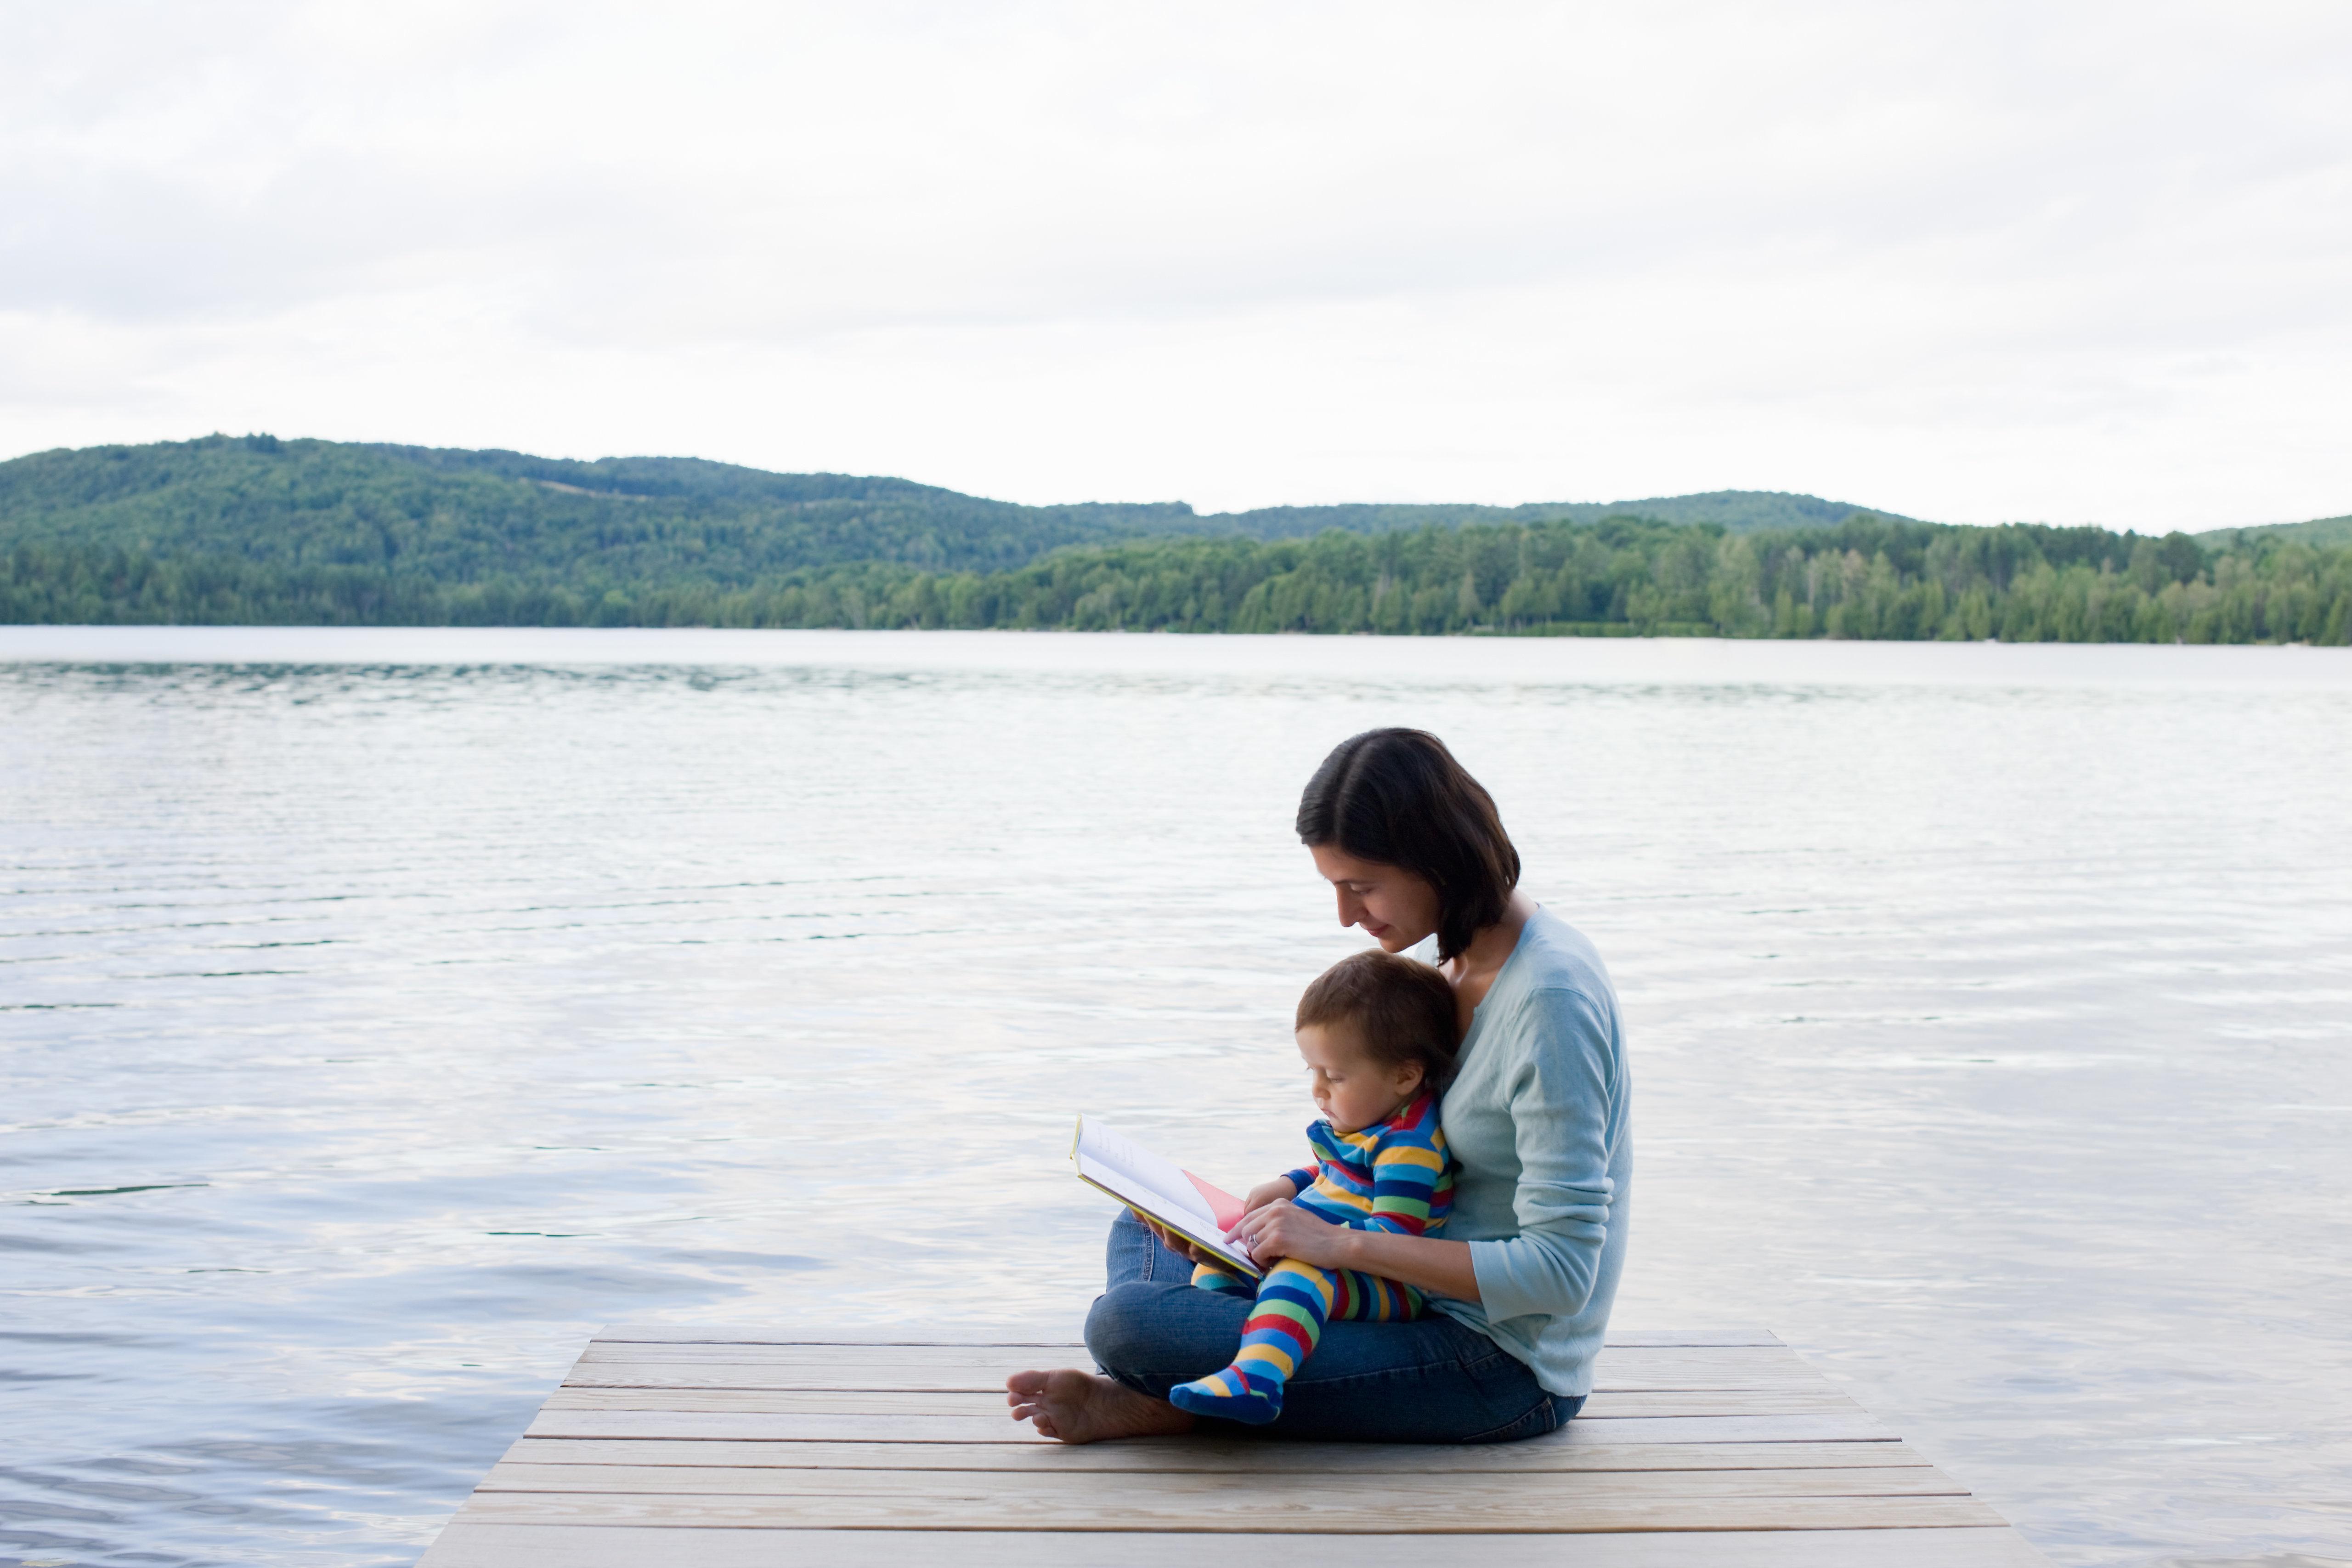 Caspian Lake, Vermont